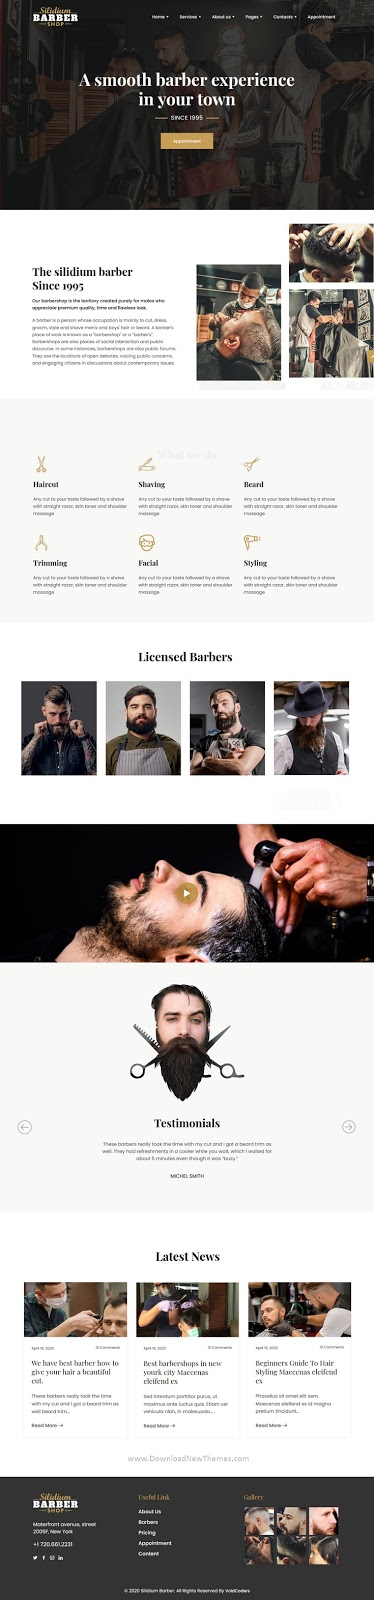 Barber Shop HTML5 Template